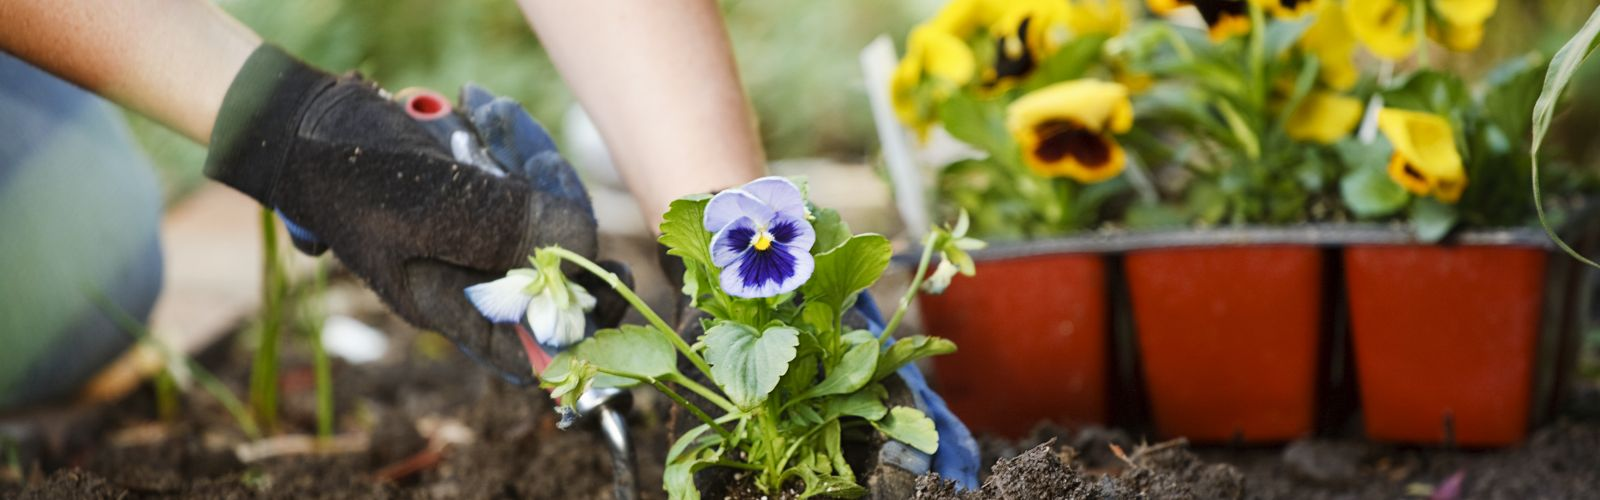 hands planting a viola flower in soil